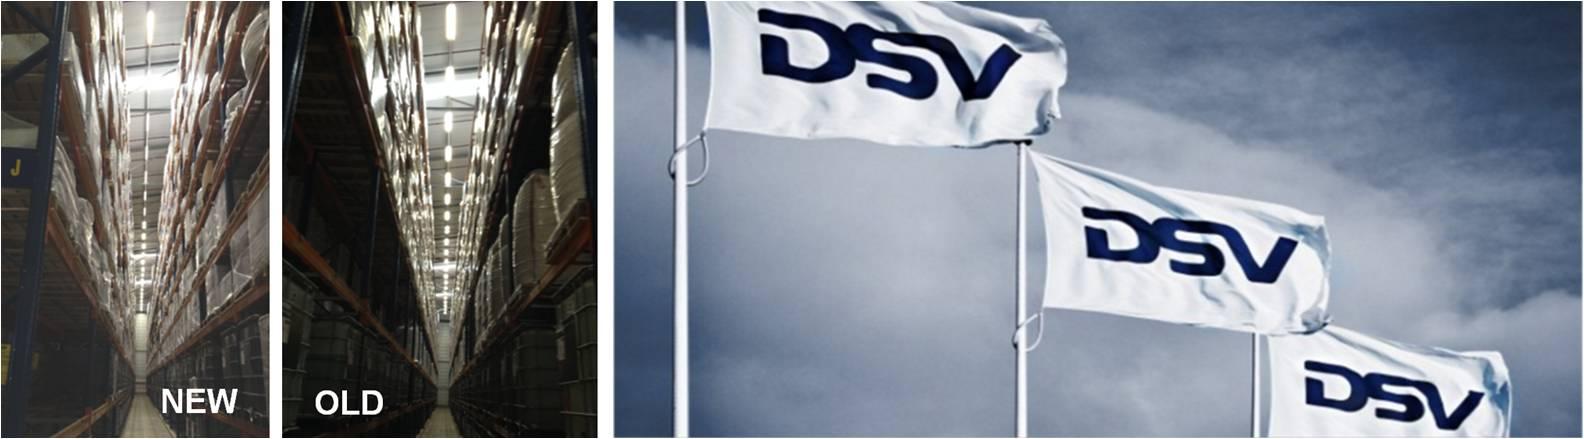 LED Distribution | Projects | Logistics (DSV) | Venlo, Netherlands